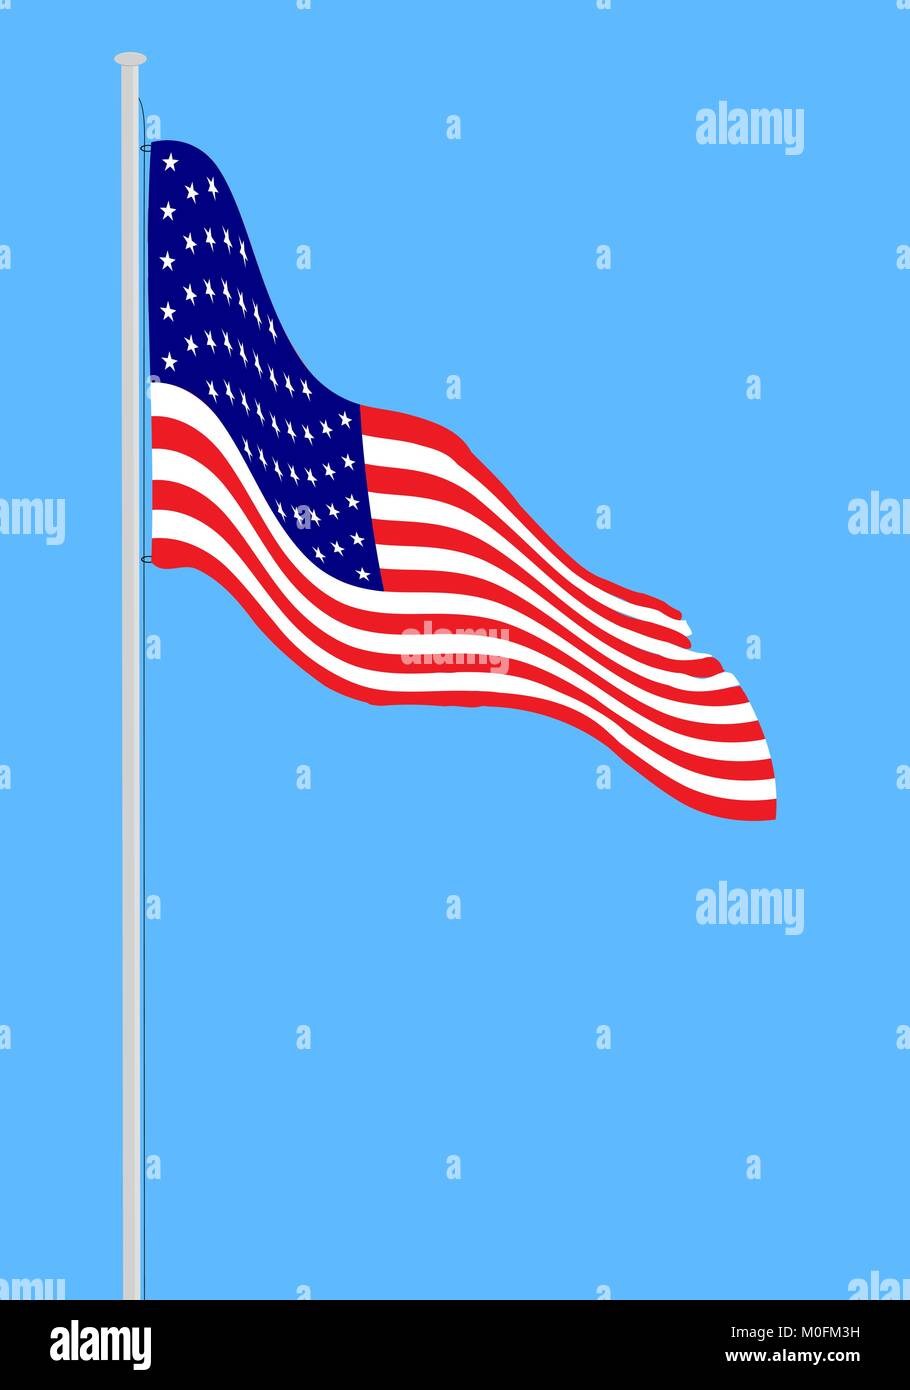 Waving American flag. Isolated vector USA flag illustration for flyer, banner, greeting card, print, poster, design - Stock Vector